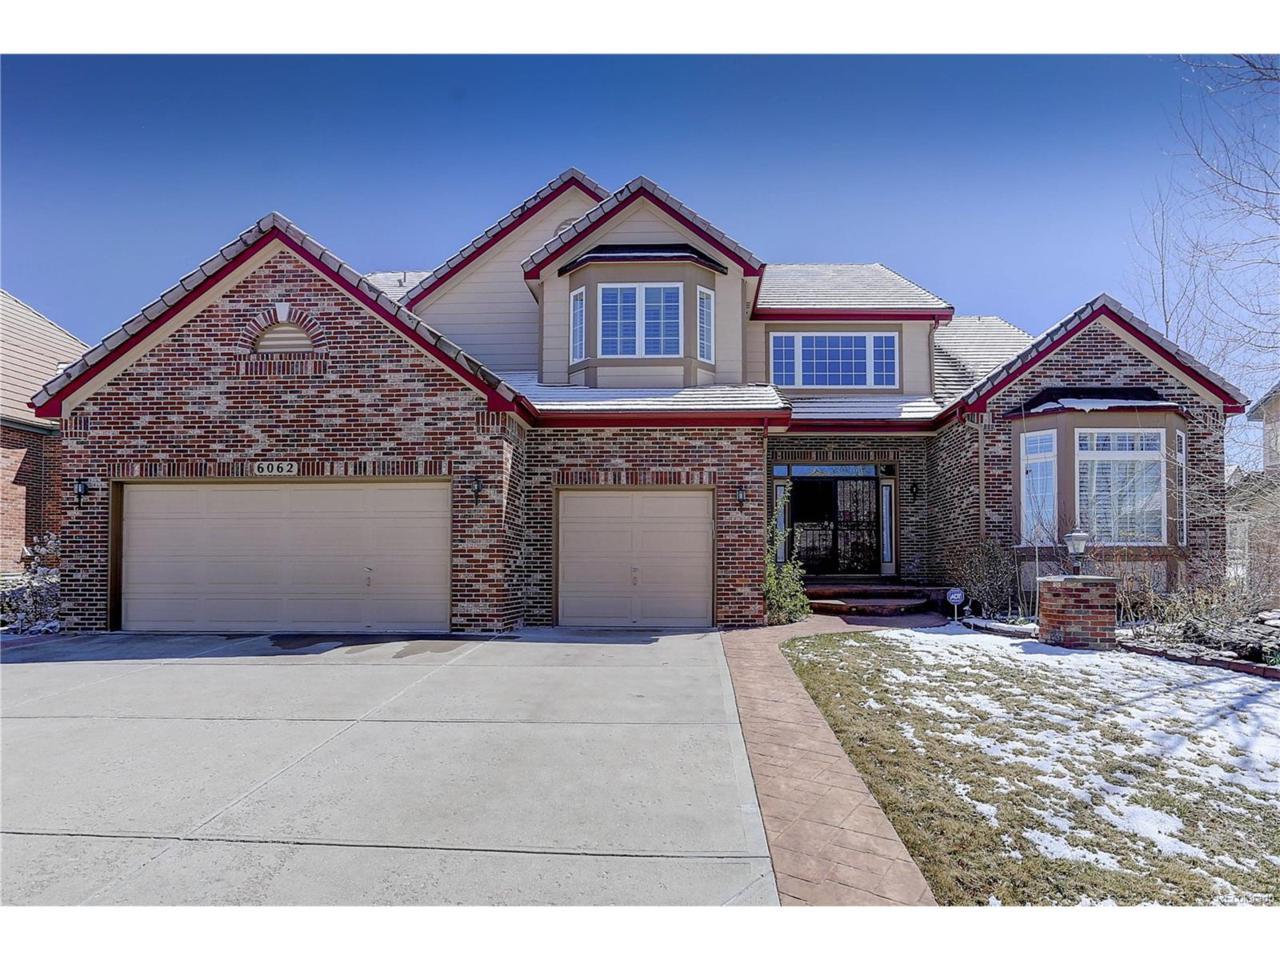 6062 S Espana Way, Aurora, CO 80016 (MLS #7479642) :: 8z Real Estate